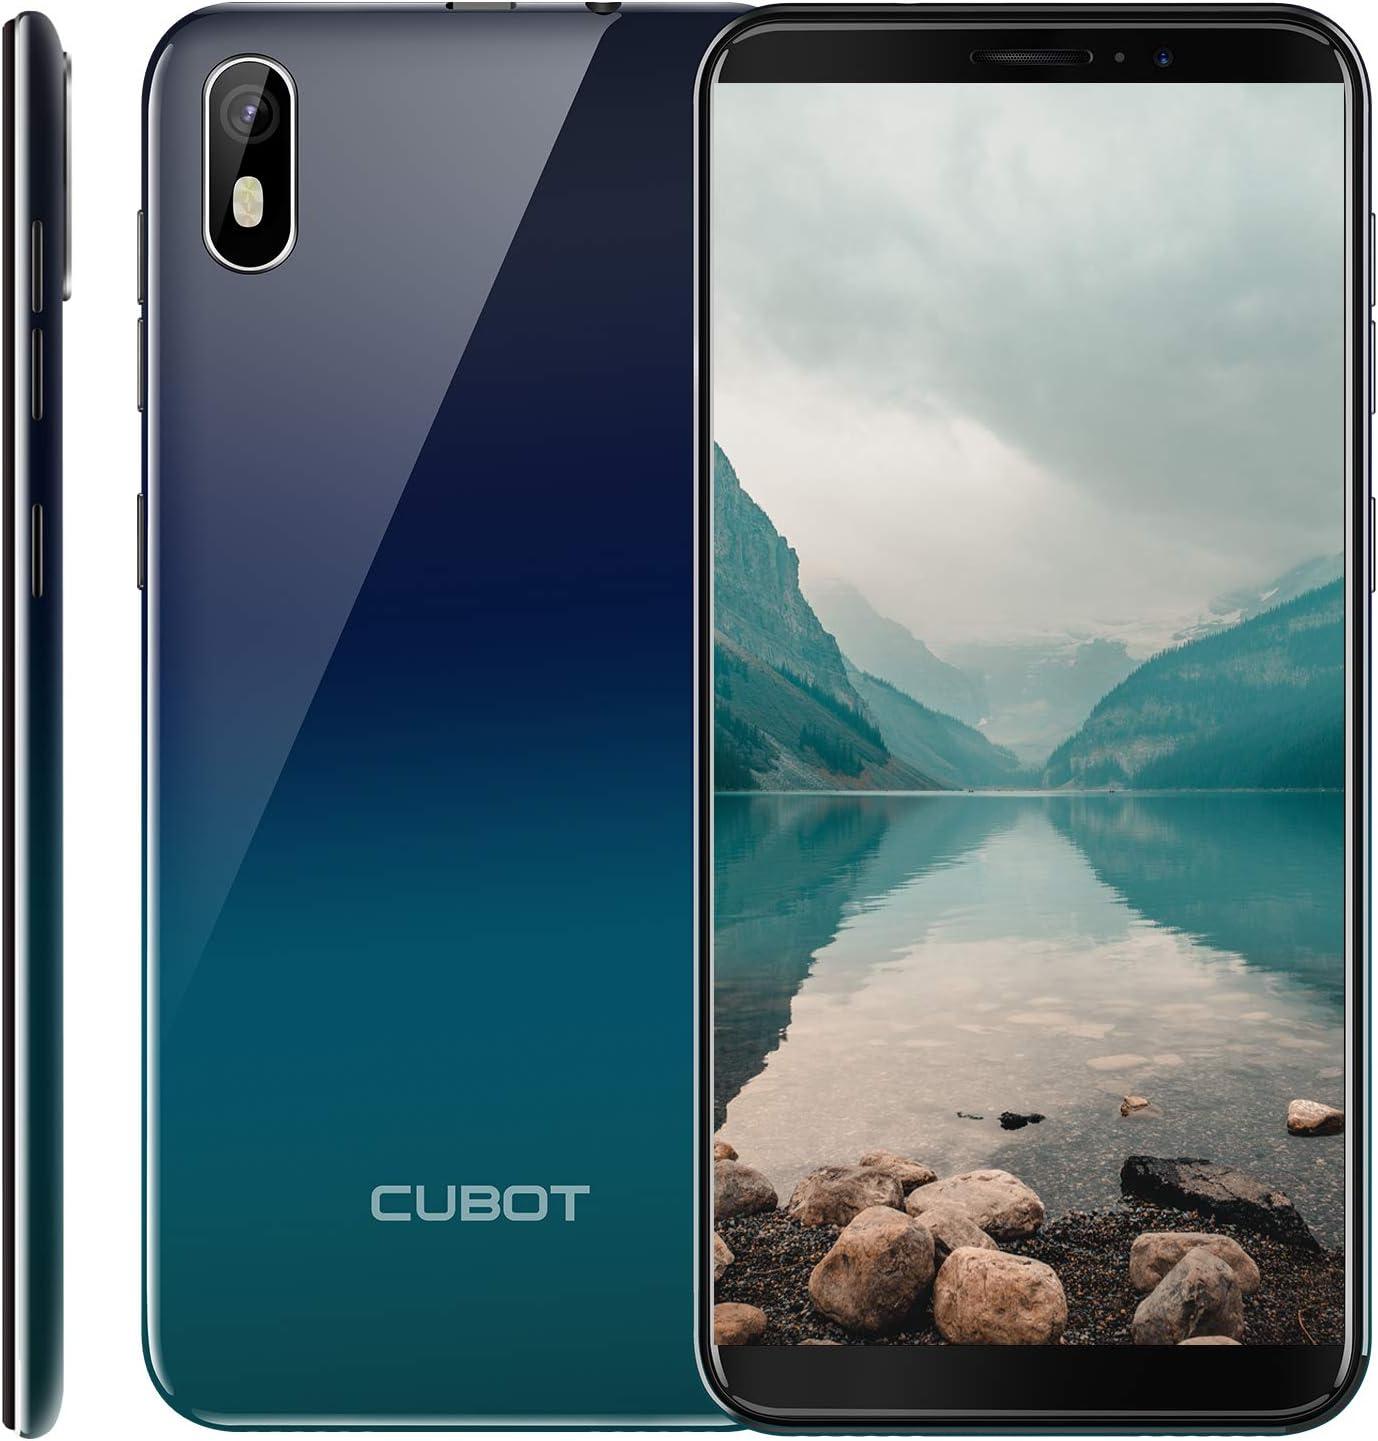 J7 CUBOT Smartphone Libre sin Contacto Android 9.0 3G 5.7 Pulgadas ...